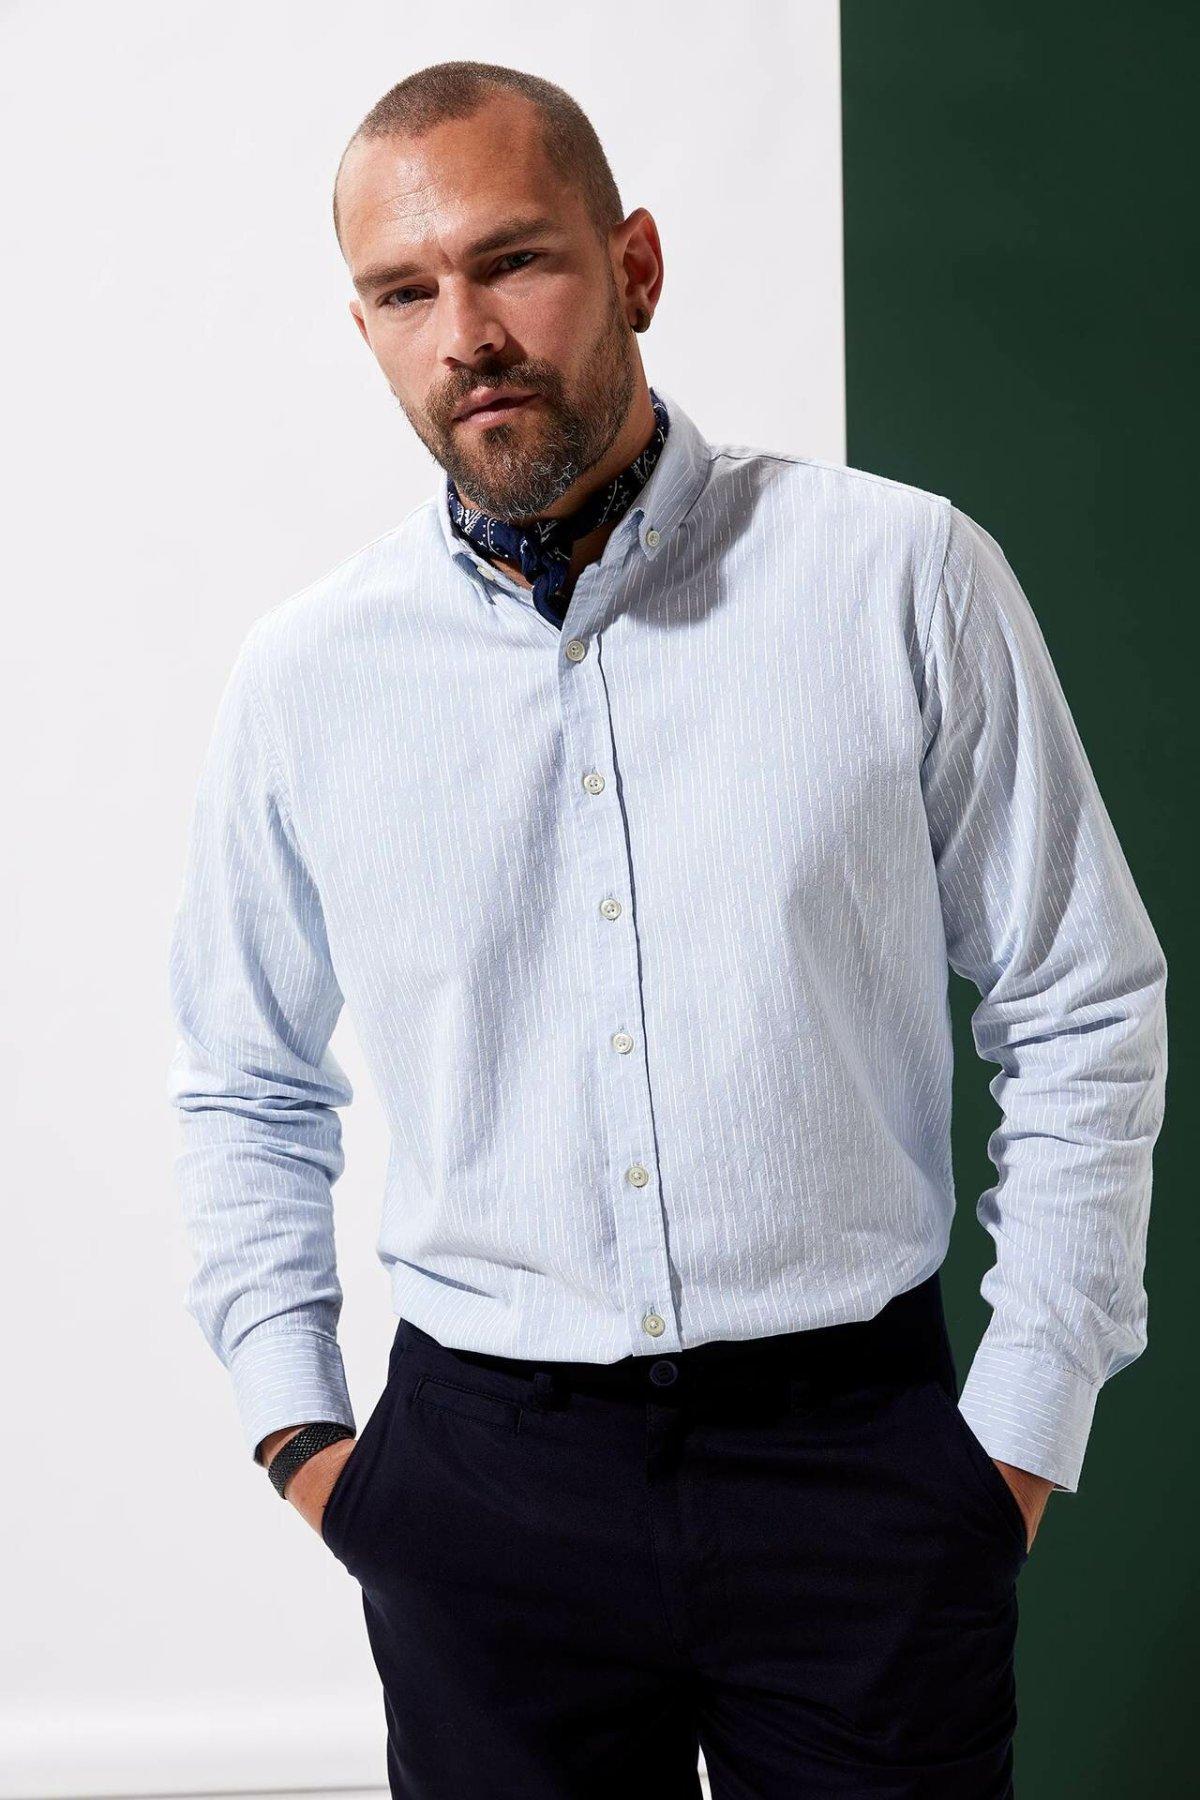 DeFacto Men Fasion Formal Simple White Lapel Collar Shirt Woven Top Long Sleeve Shirt Casual Business Wear Top Shirt-L5899AZ19AU